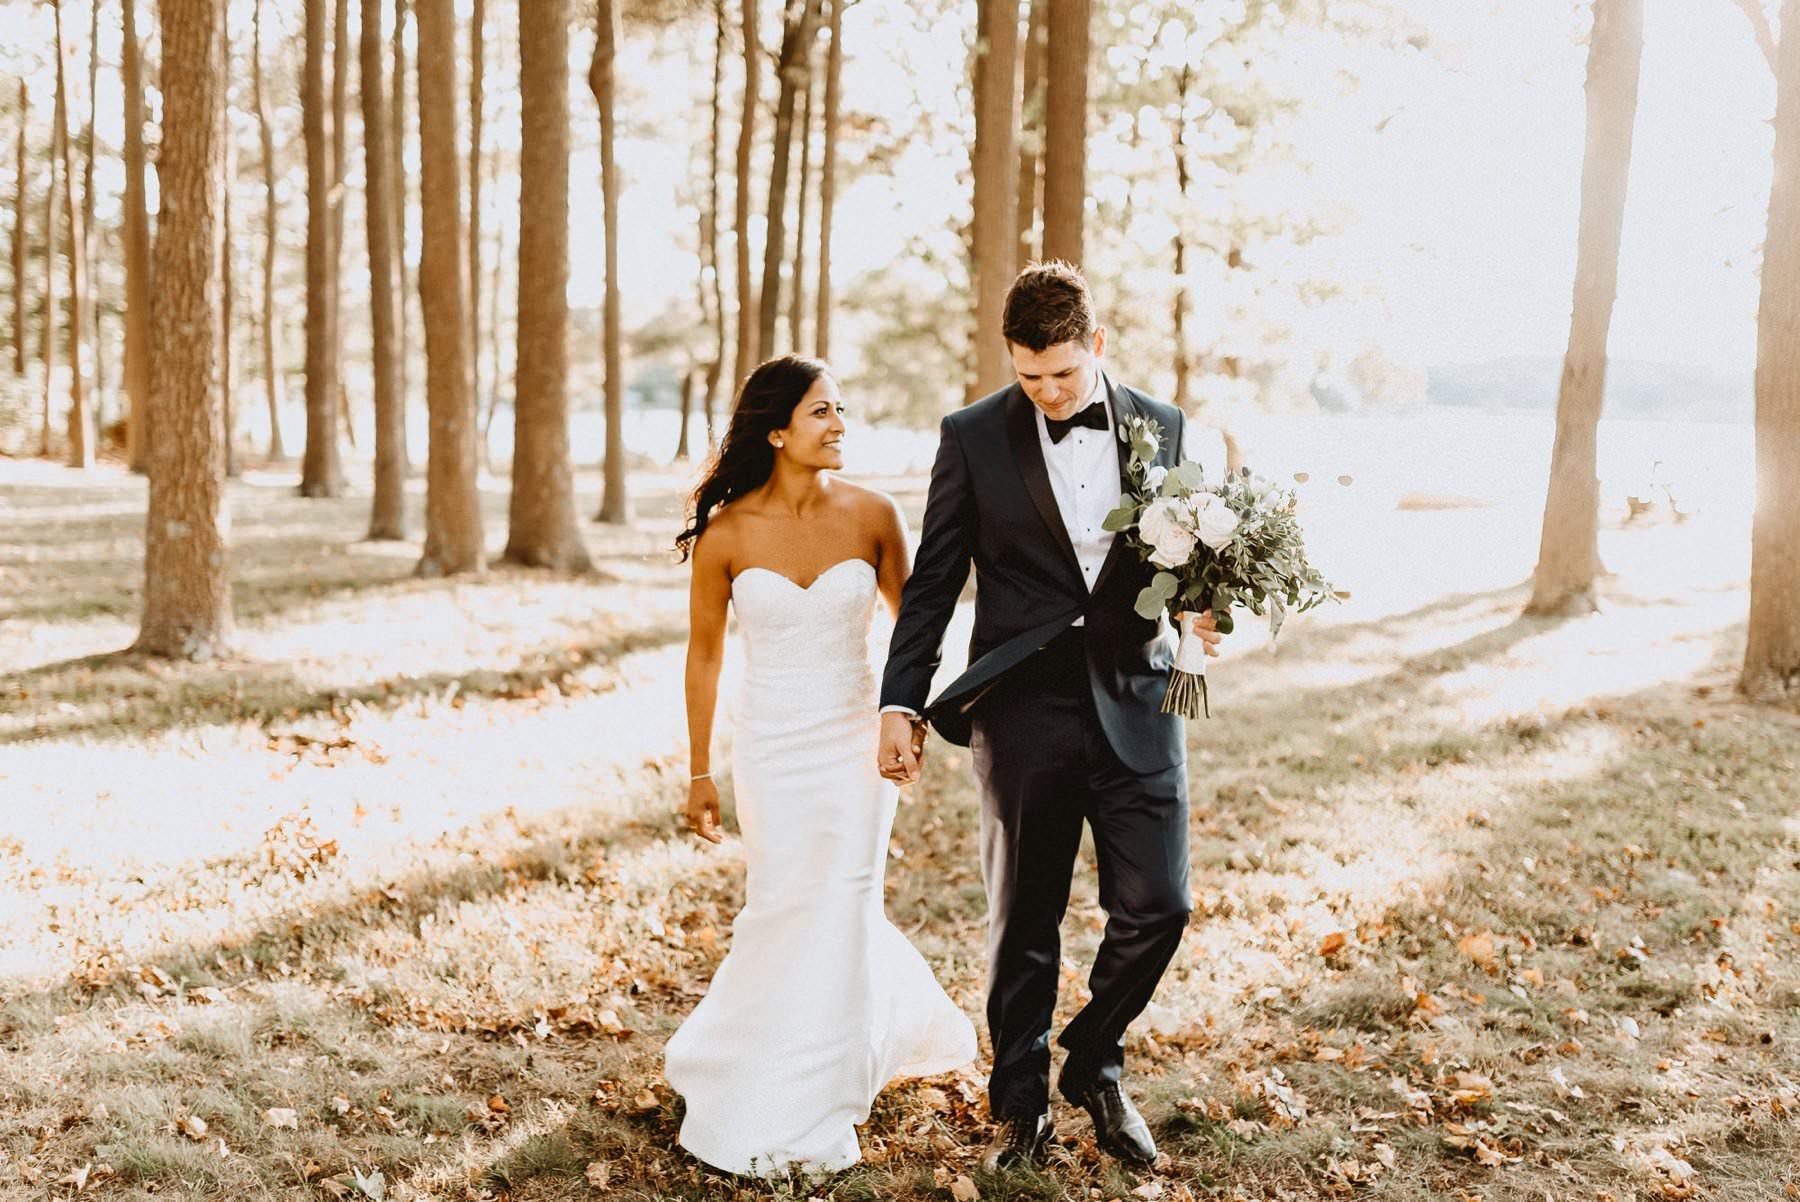 Philadelphia_private_estate_wedding-052.jpg